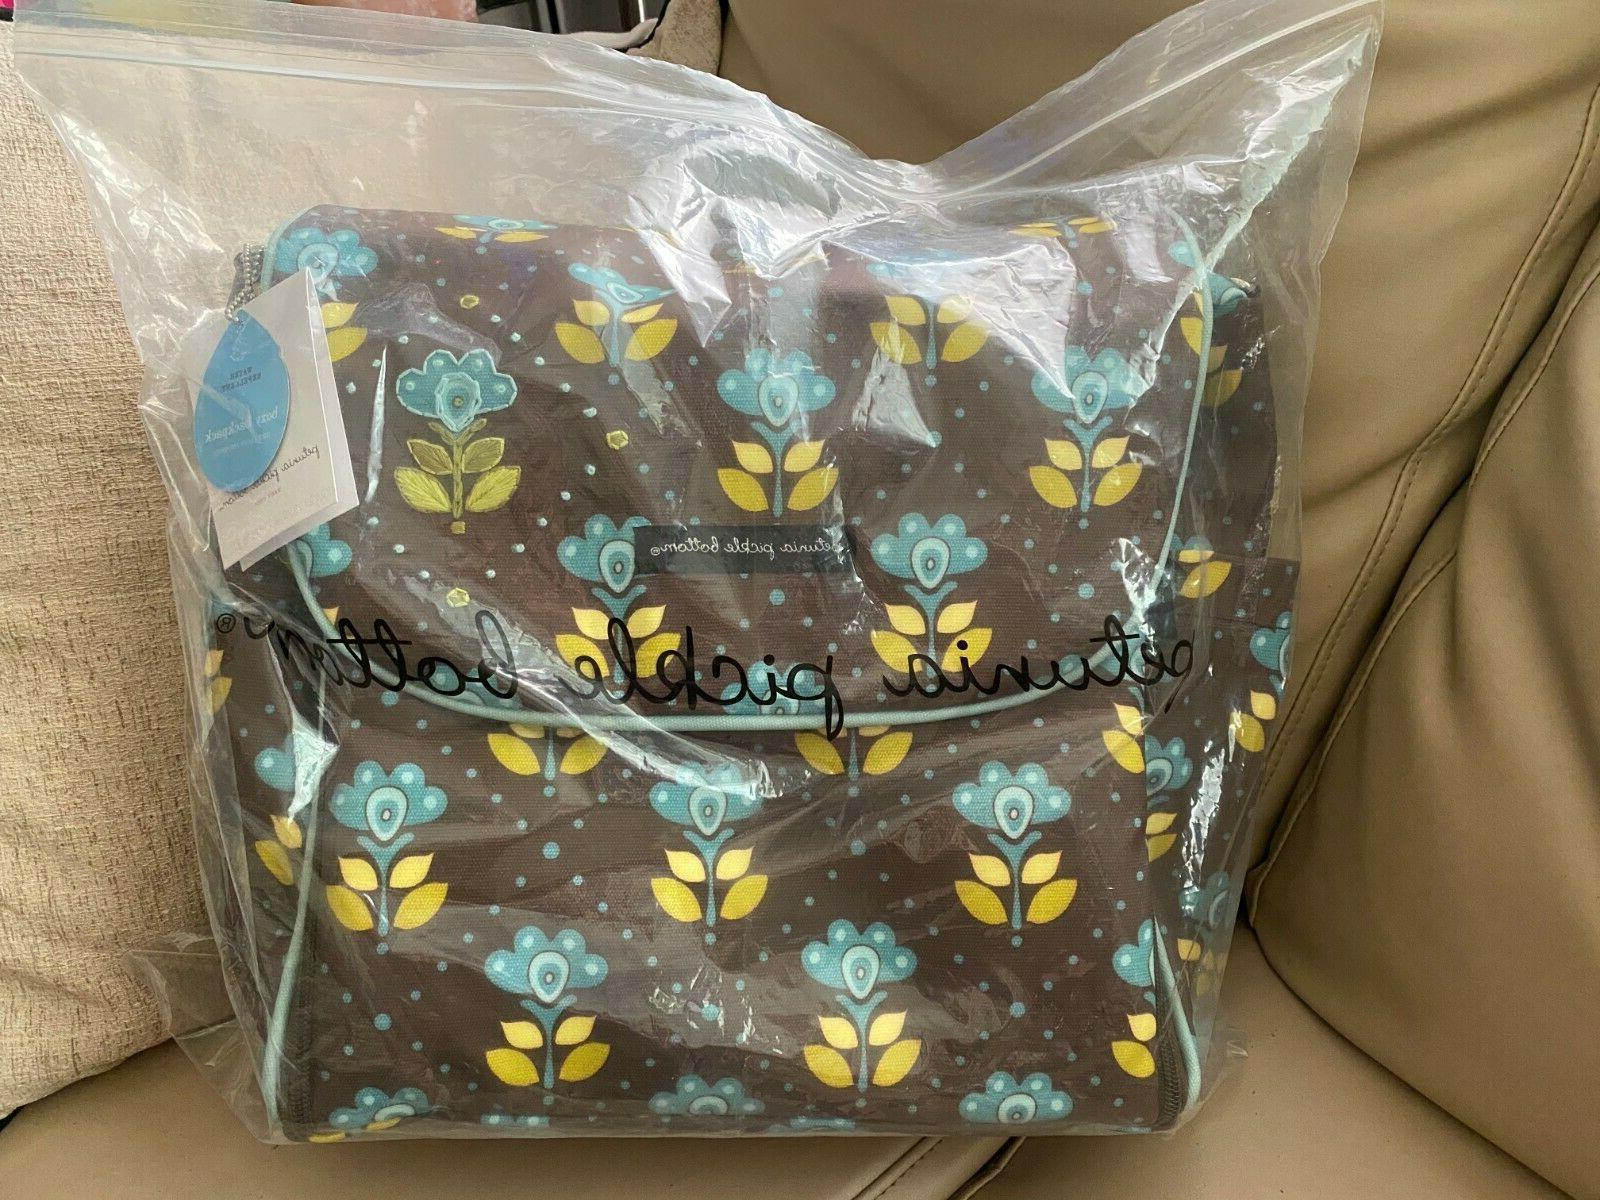 Petunia Pickle Bottom backpack diaper